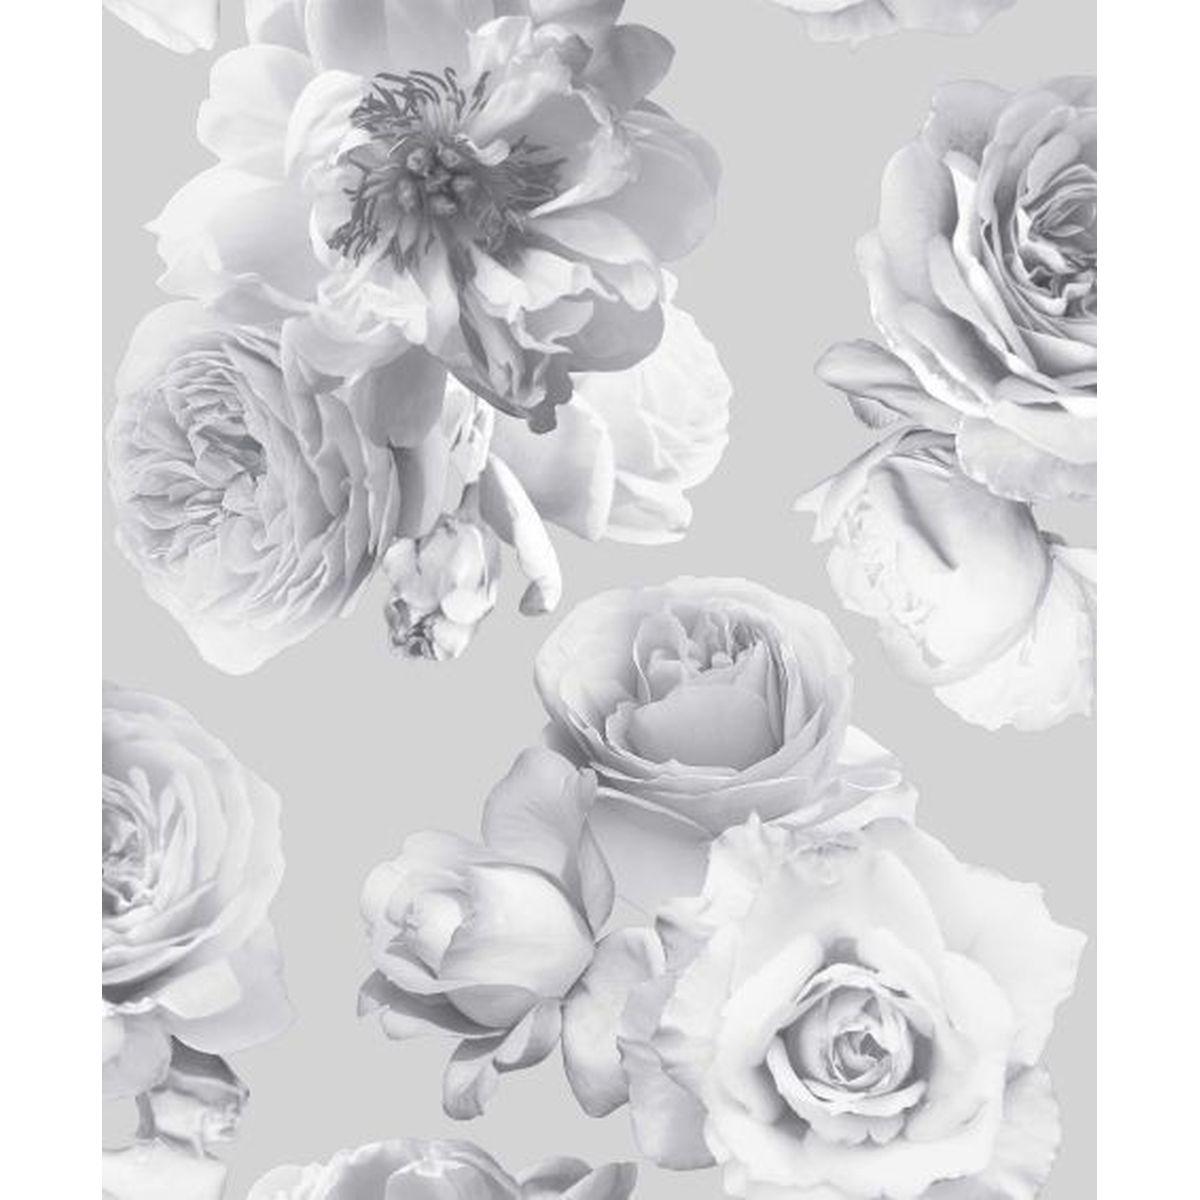 Best of Arthouse Vliestapete Erstklassige Wandbekleidung 683003 Grau Blumentapete